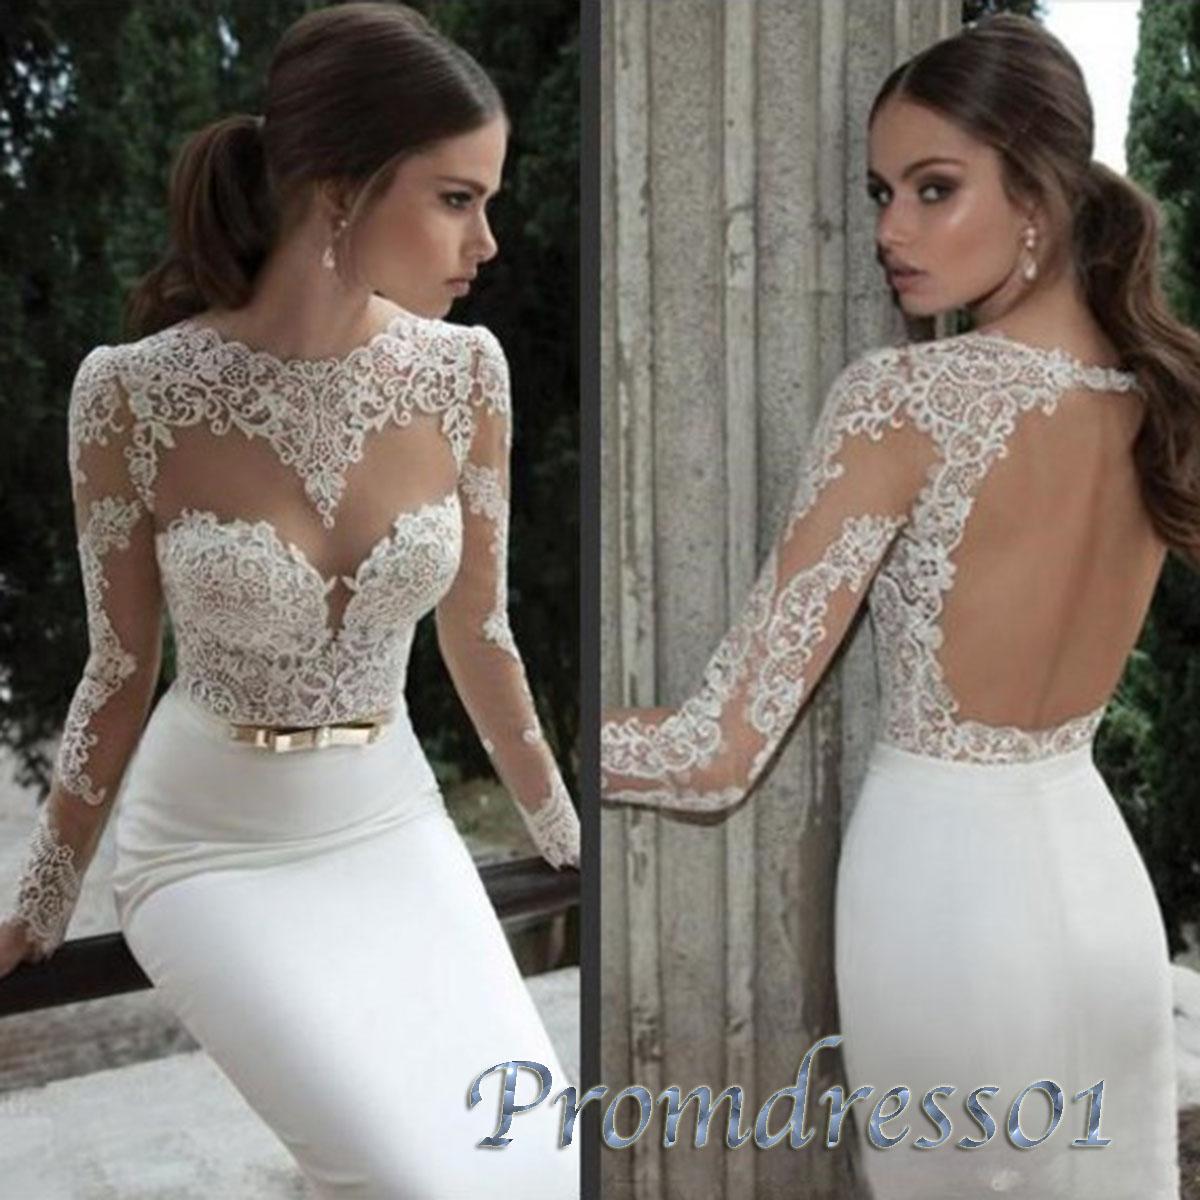 Elegant lace chiffon wedding dress with sleeves